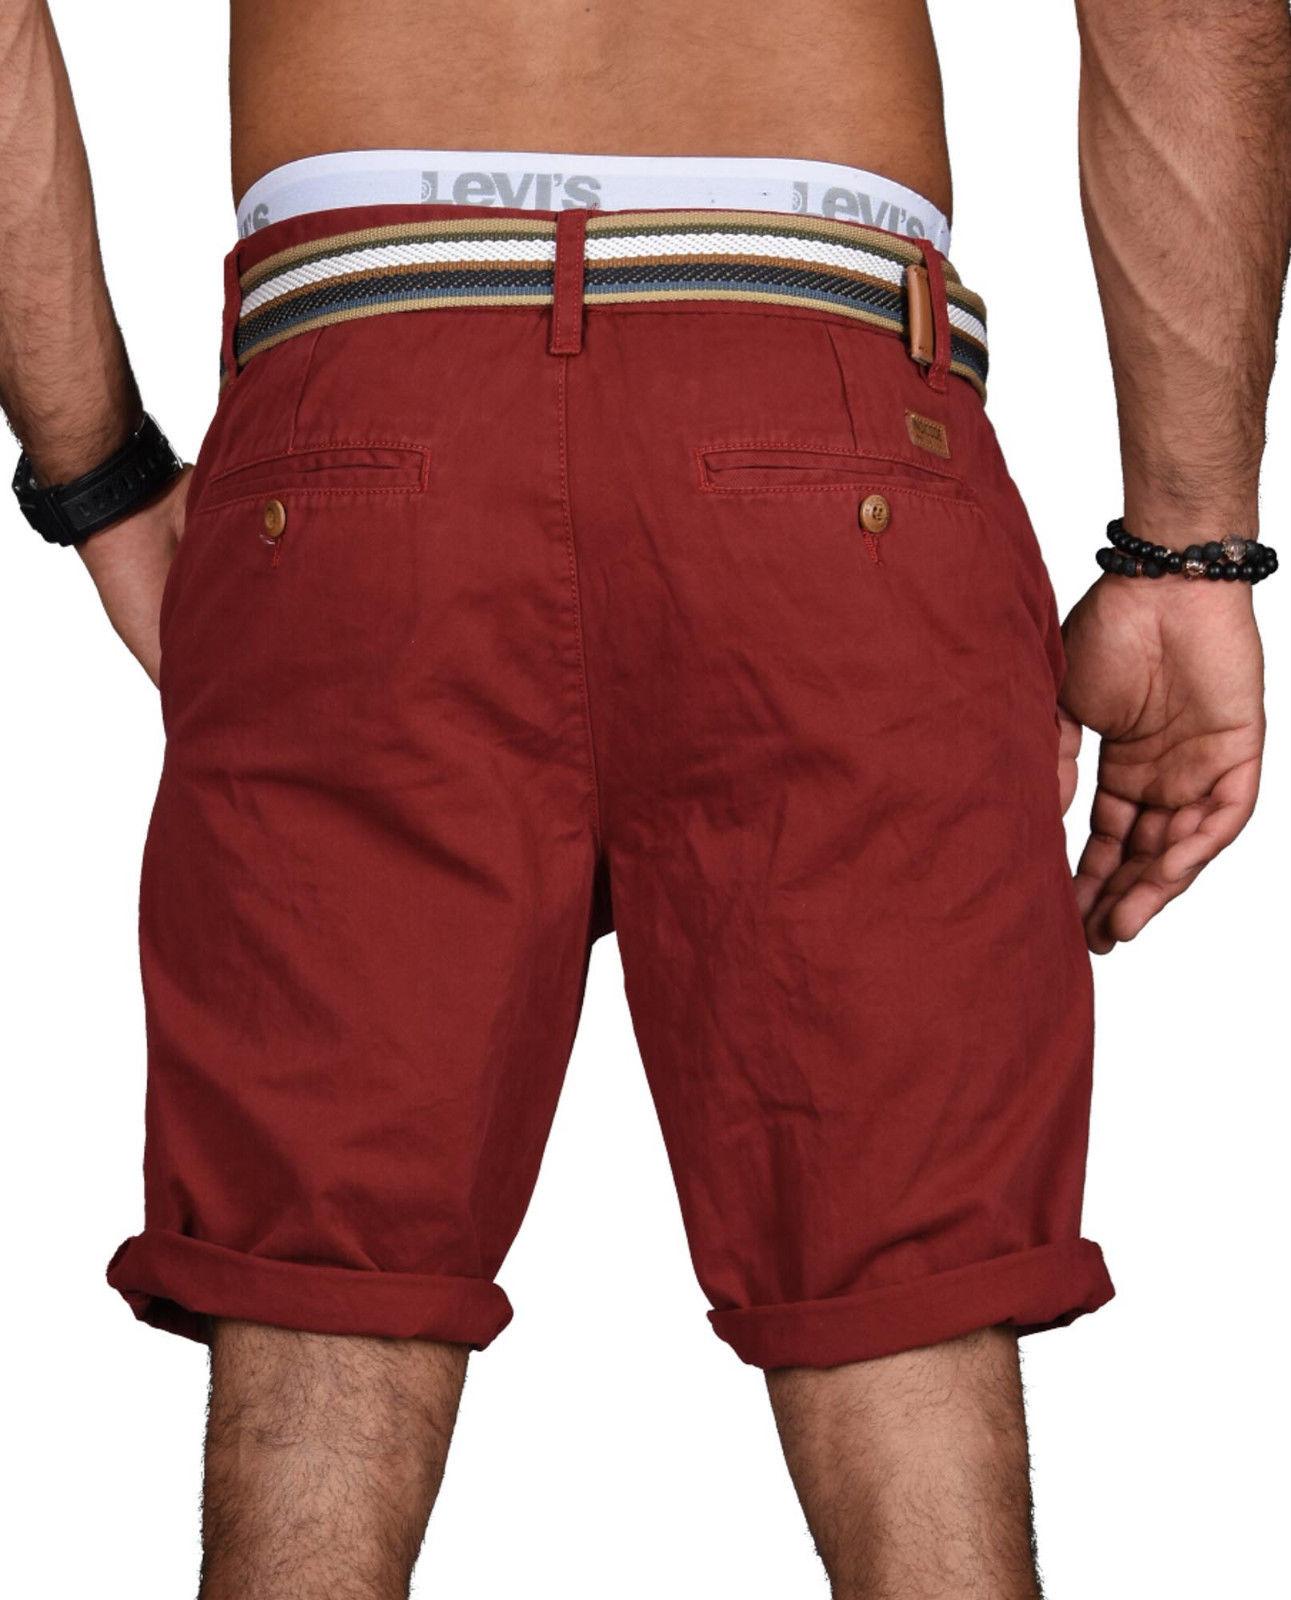 Indicode-Herren-Sommer-Bermuda-Chino-Shorts-kurze-Hose-Sommerhose-Short-NEU-B499 Indexbild 25